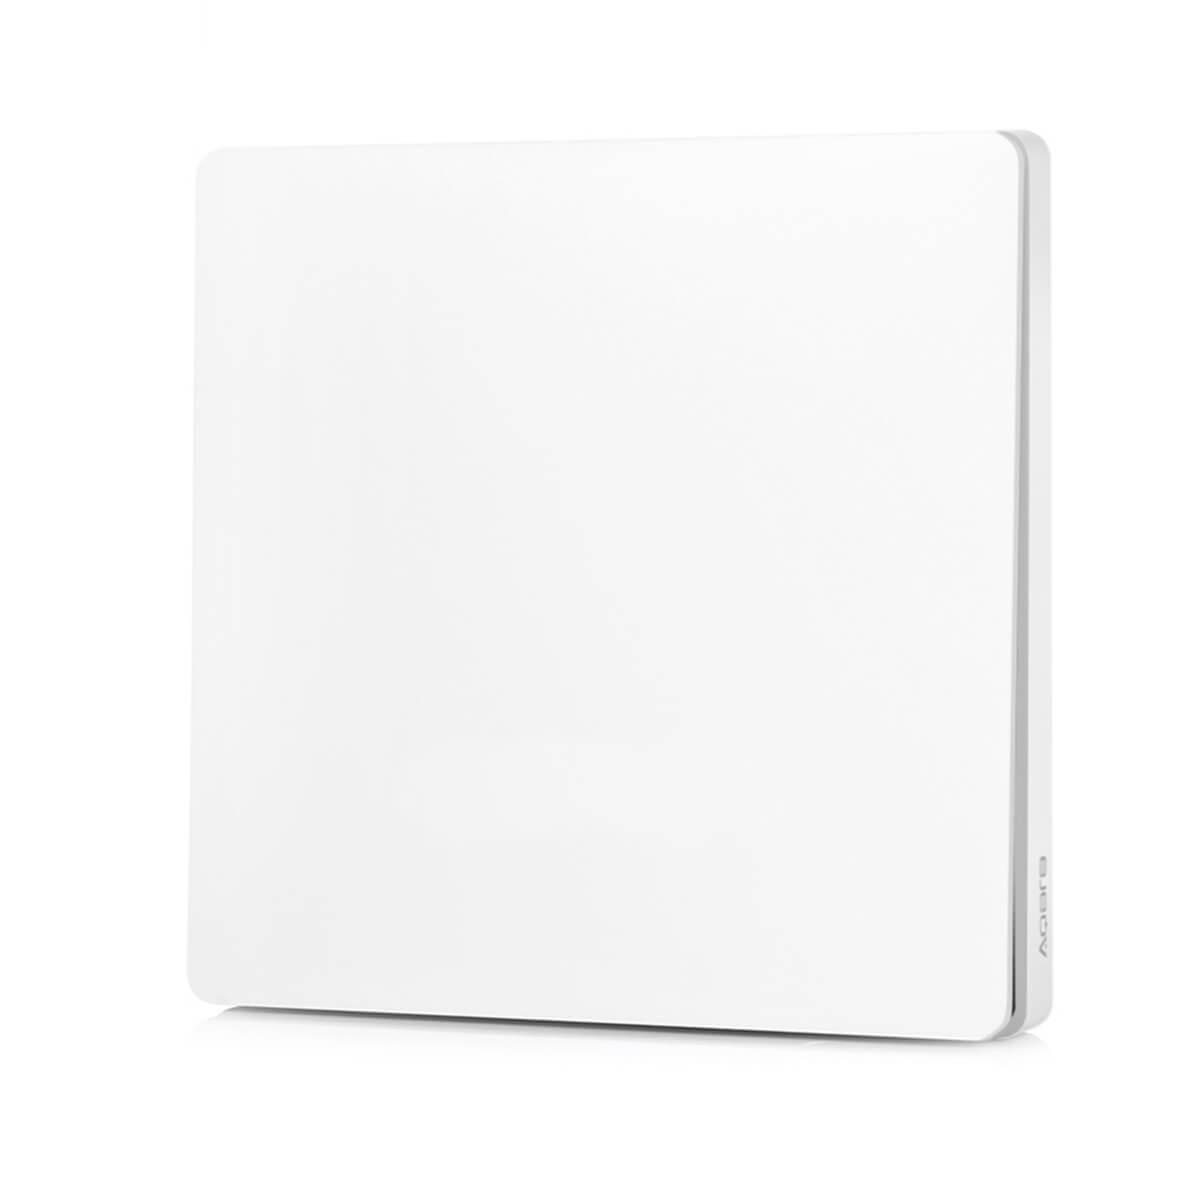 Умный выключатель Aqara <b>Light Switch</b> (Line-Neutral <b>Single</b> ...